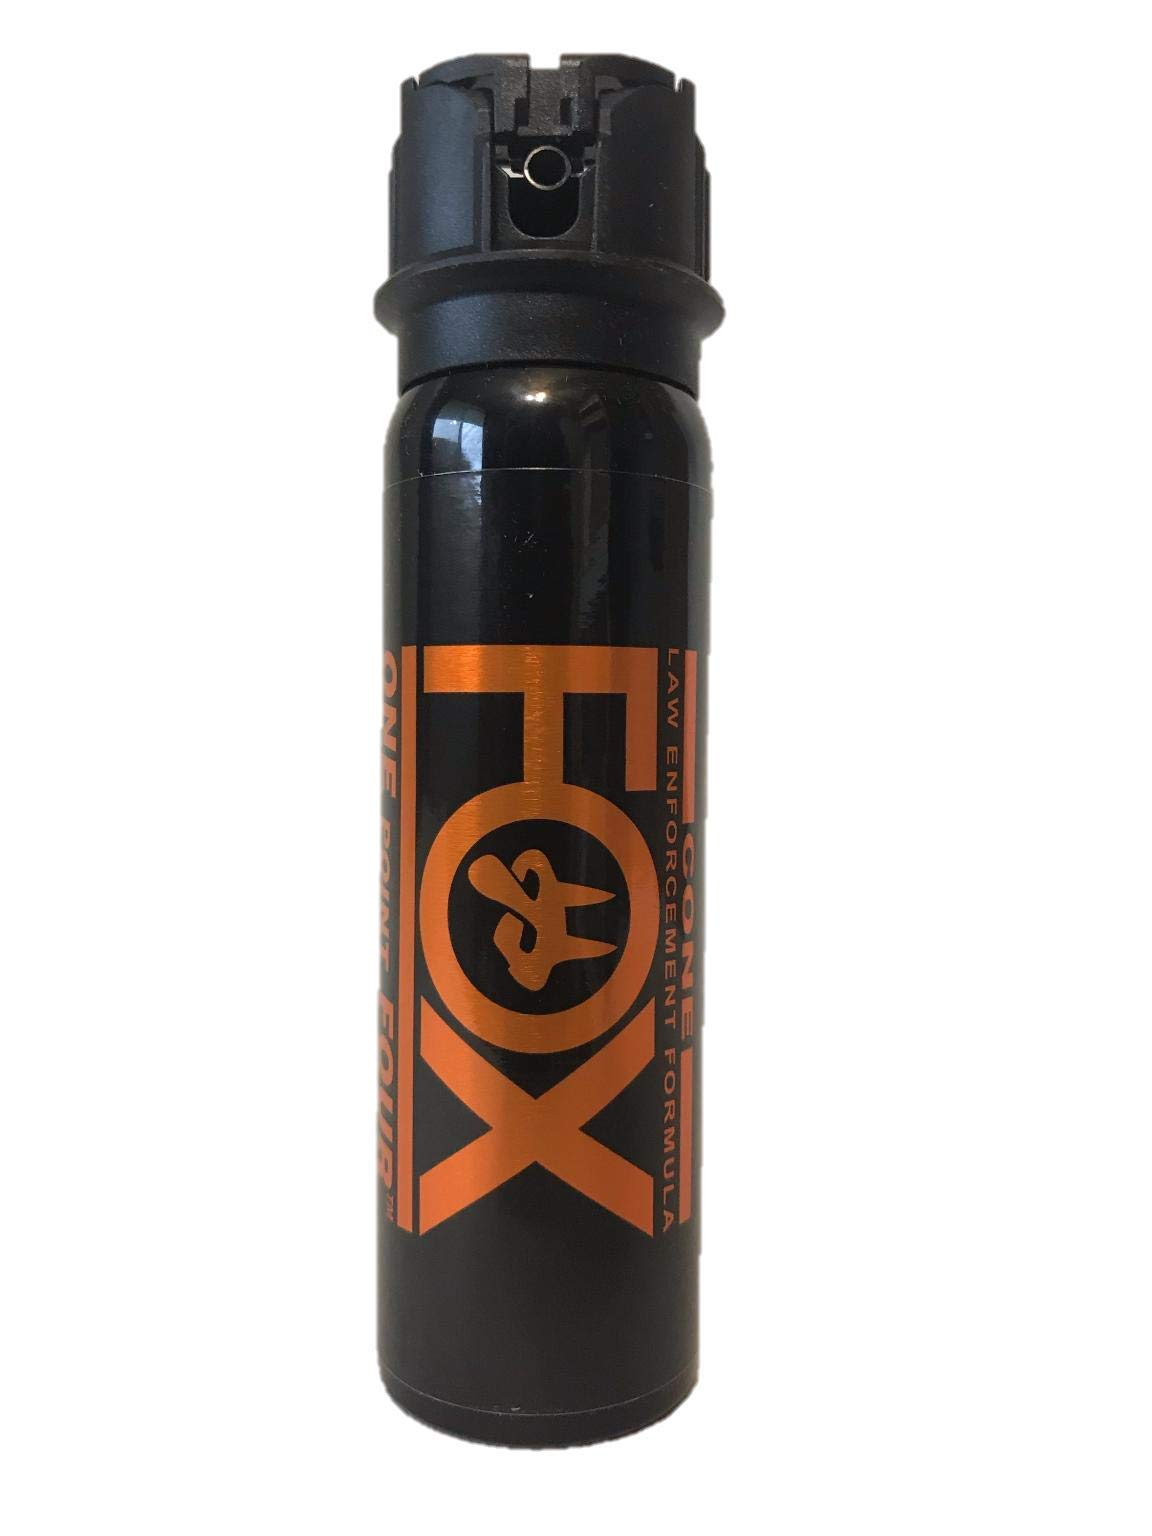 Fox Labs, One Point Four, 4% OC Pepper Spray- Flip Top Cone (4 oz) 44FTM by Fox Labs